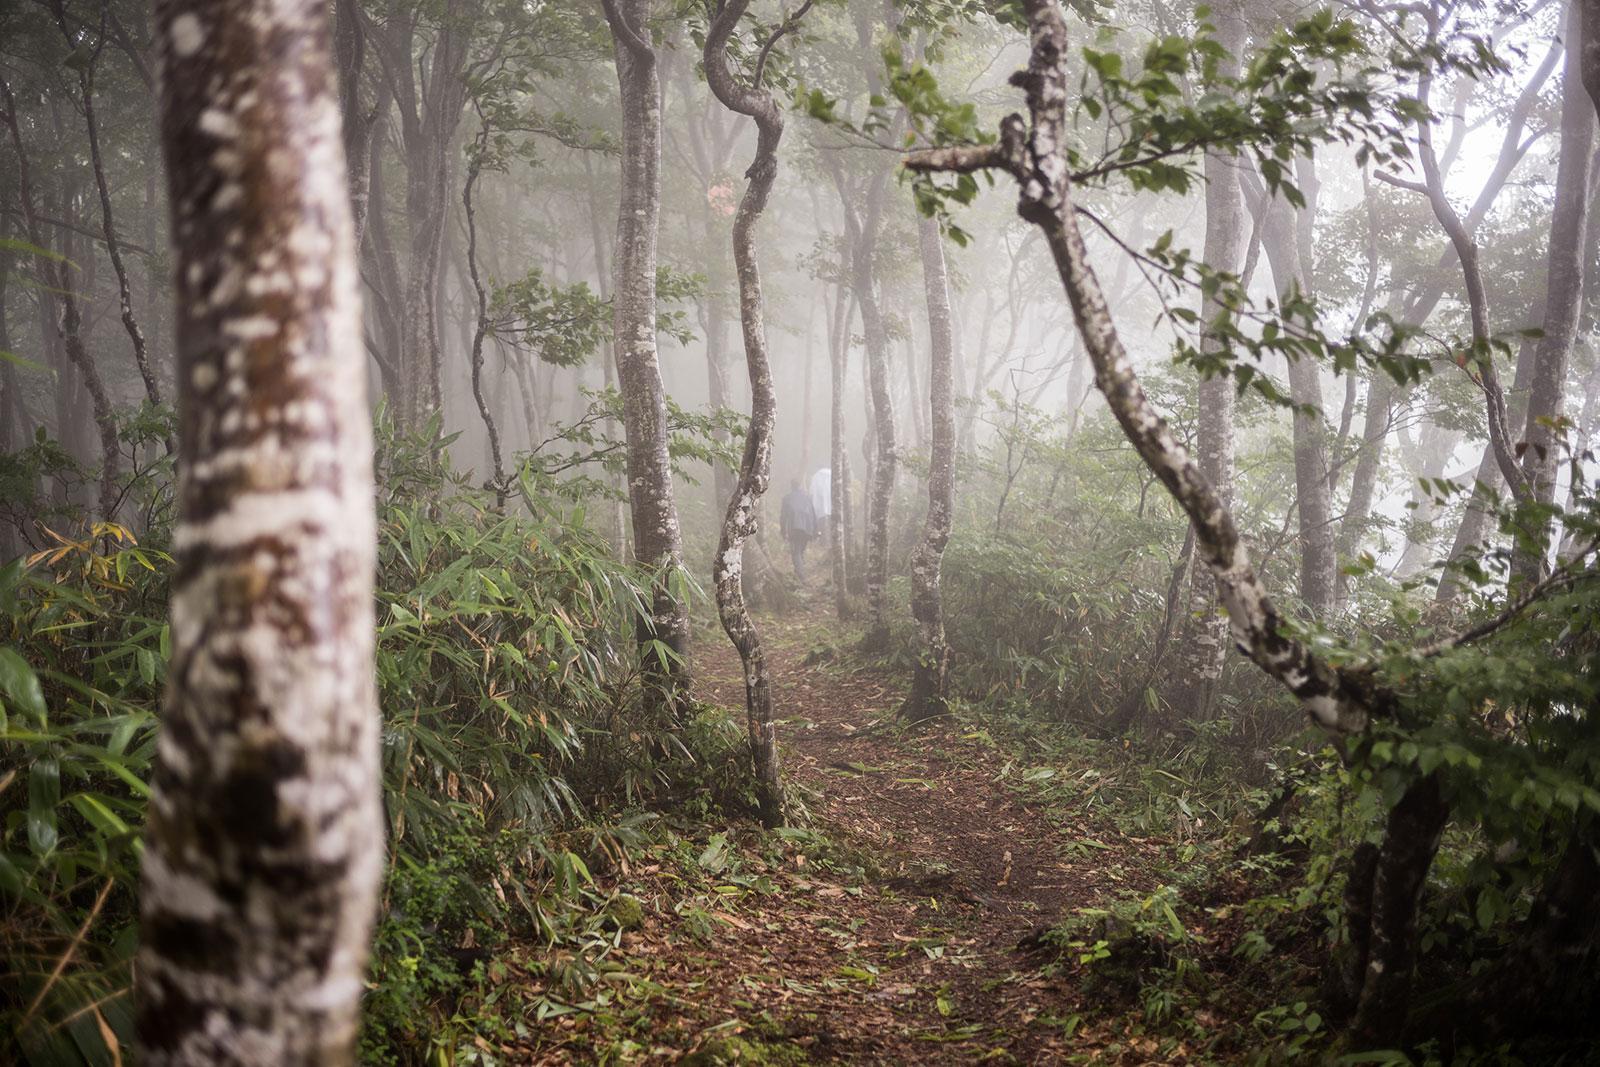 Craig Mod — Books and essays on walking, Japan, photography, and publishing